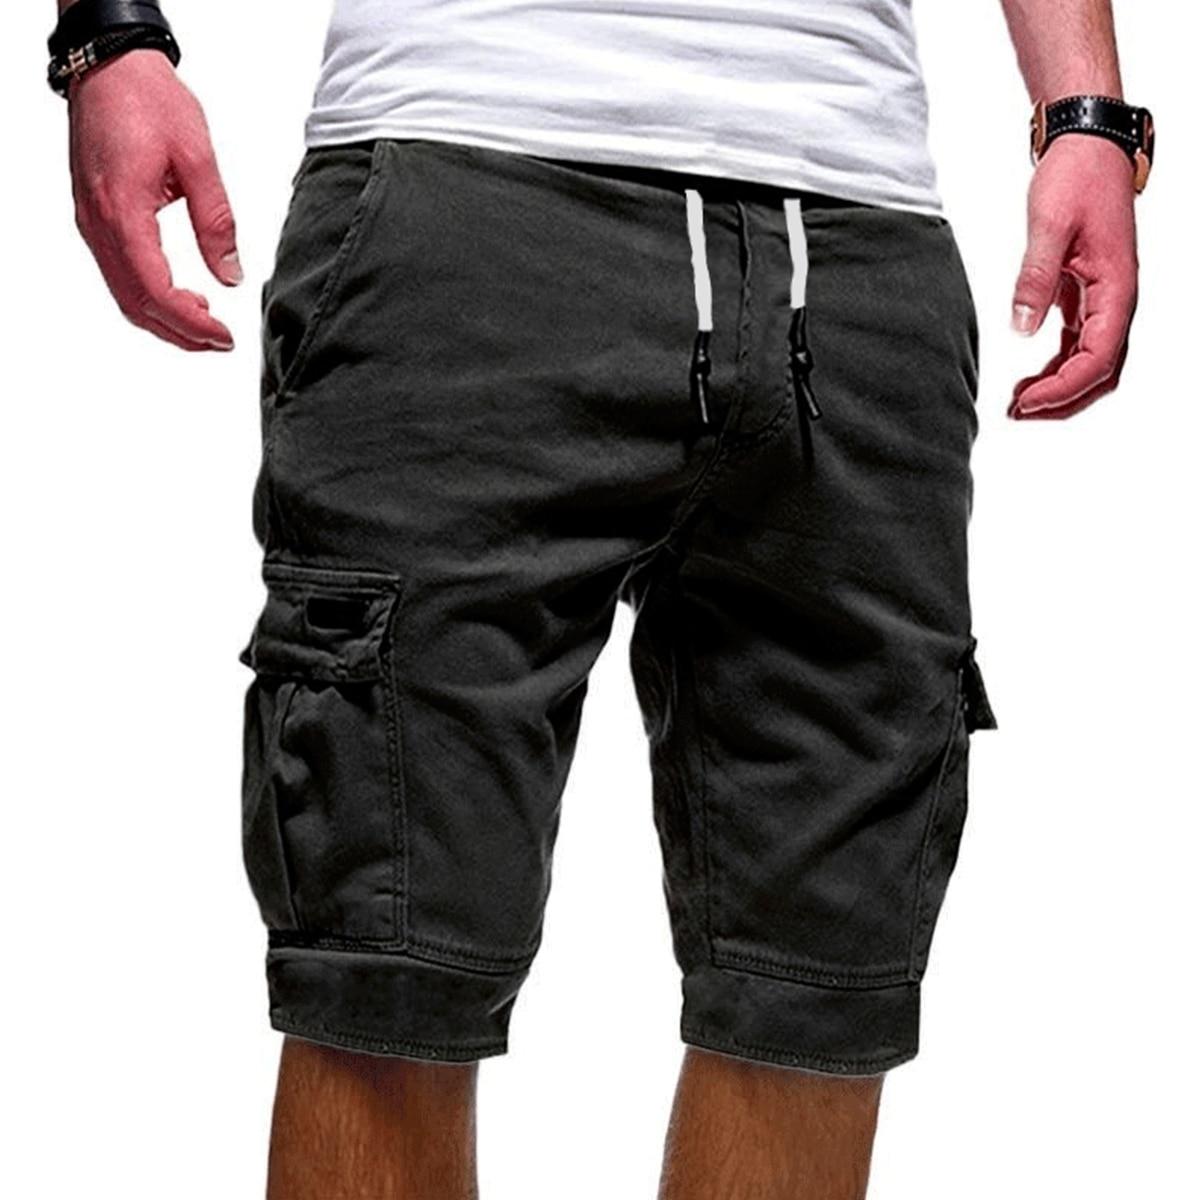 Hot-Selling Men Shorts Fitness Casual Workout Brand Pants Quality Shorts Men's Multi-pocket Sports Shorts